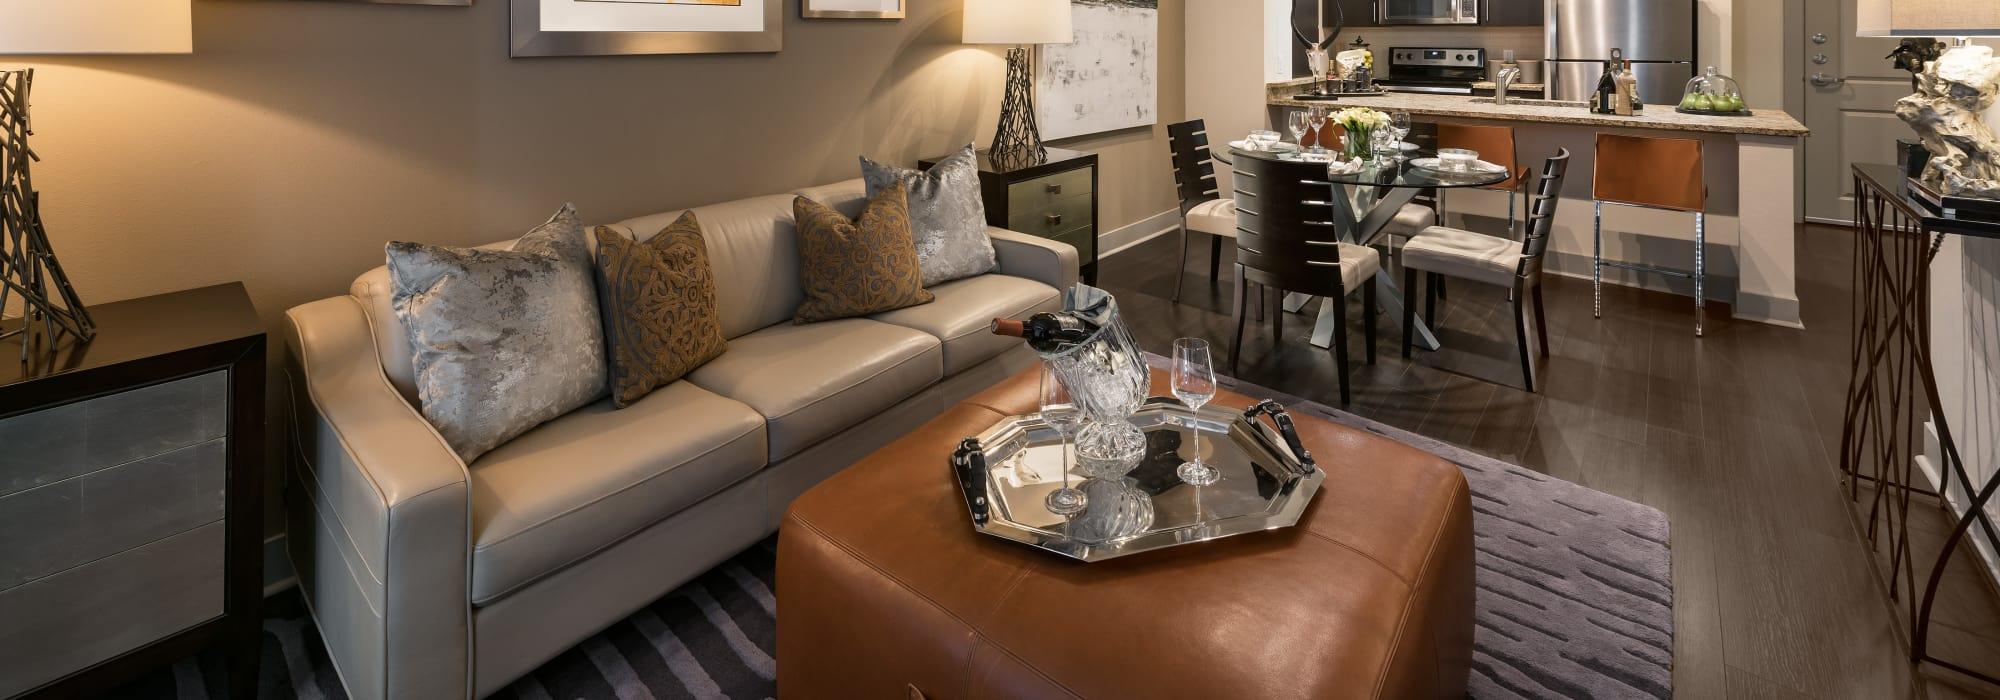 Luxury living room at Emerson Mill Avenue in Tempe, Arizona